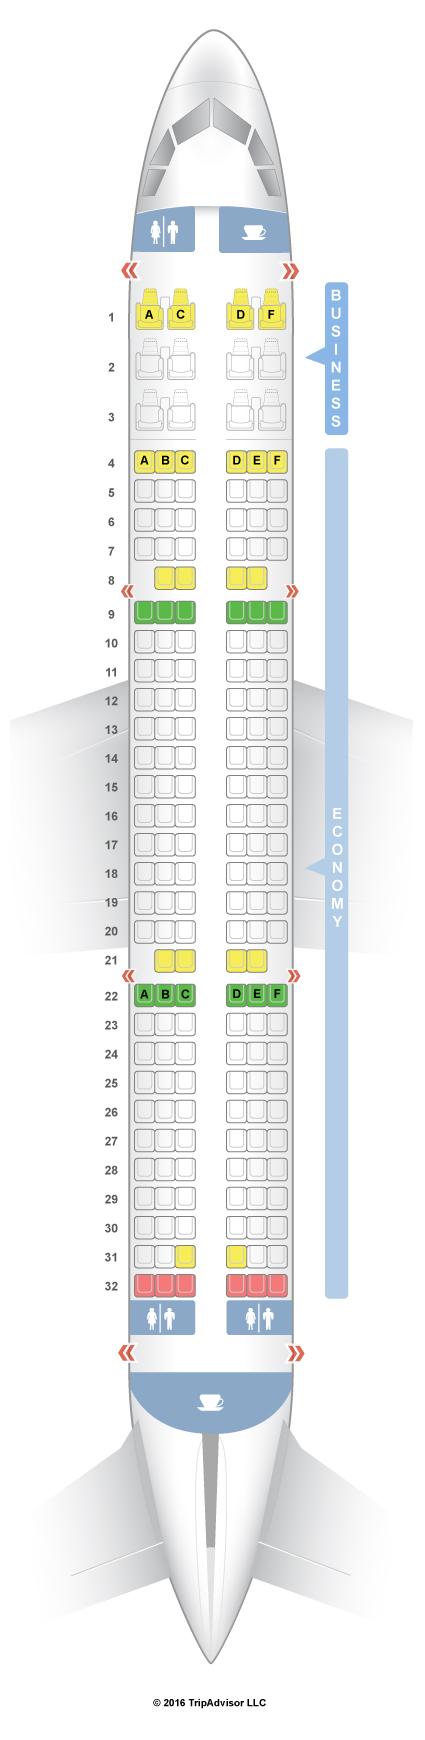 Seatguru Seat Map Air India Seatguru